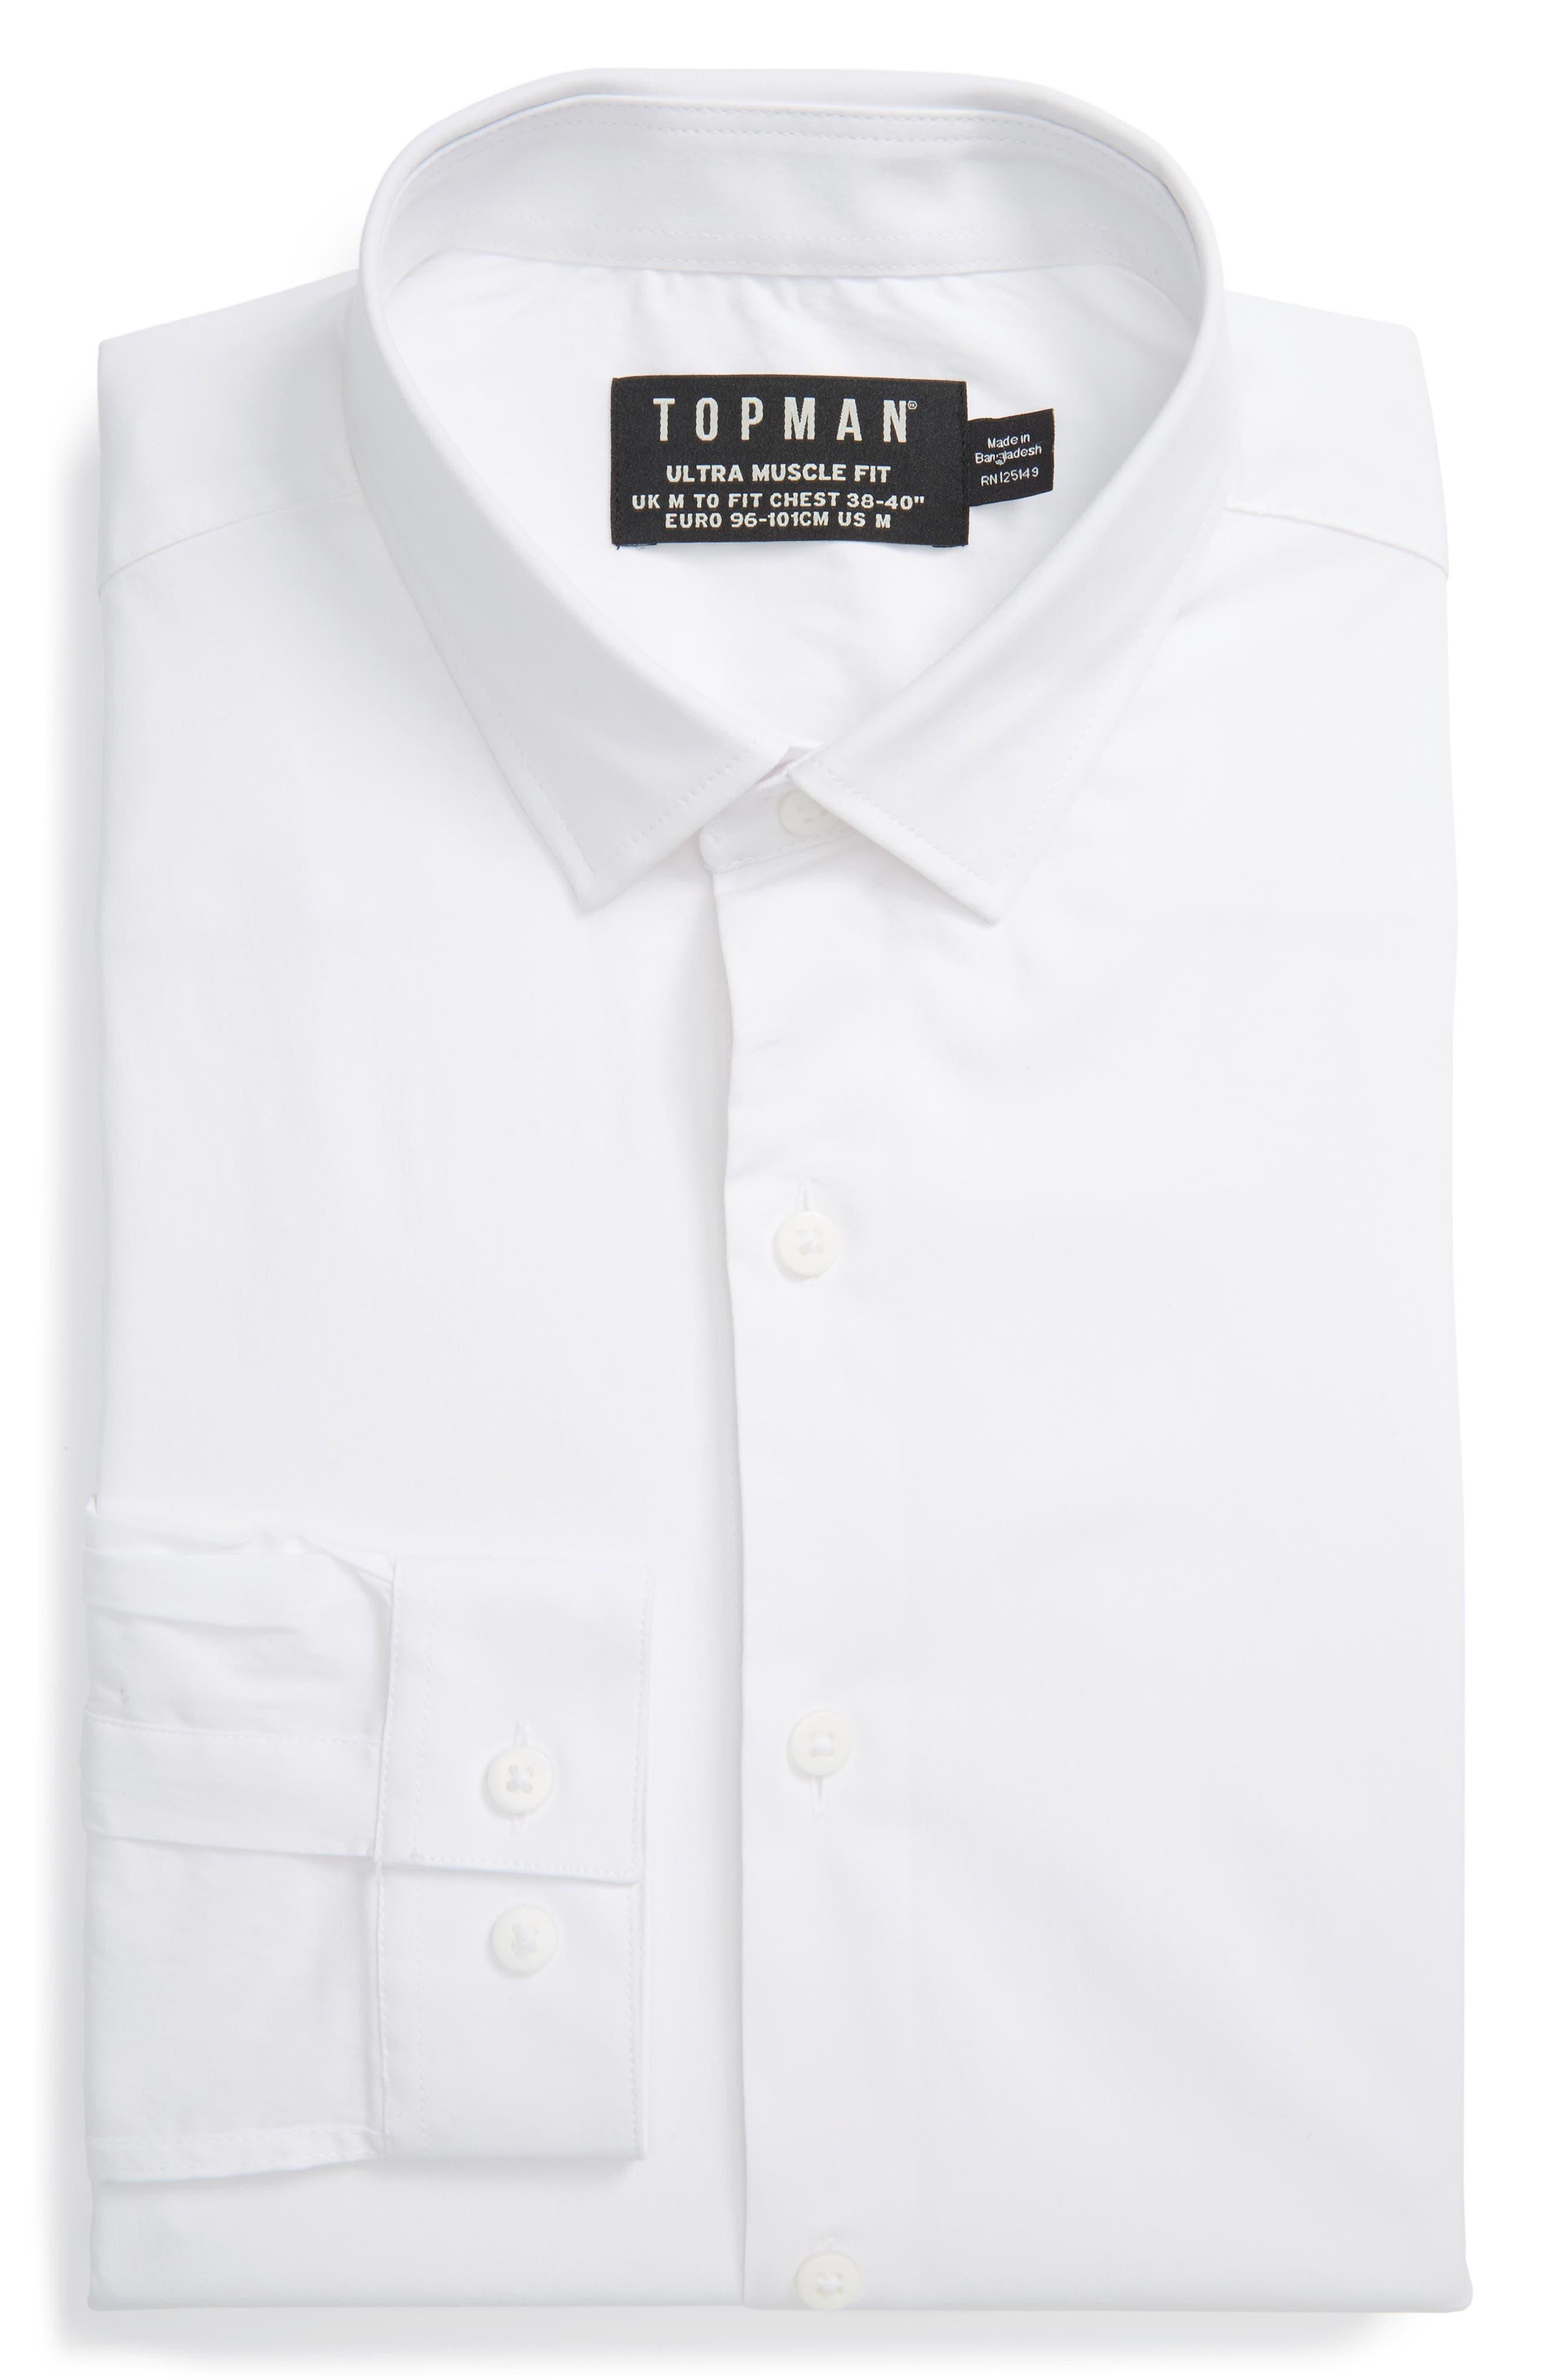 Topman Ultra Muscle Fit Dress Shirt